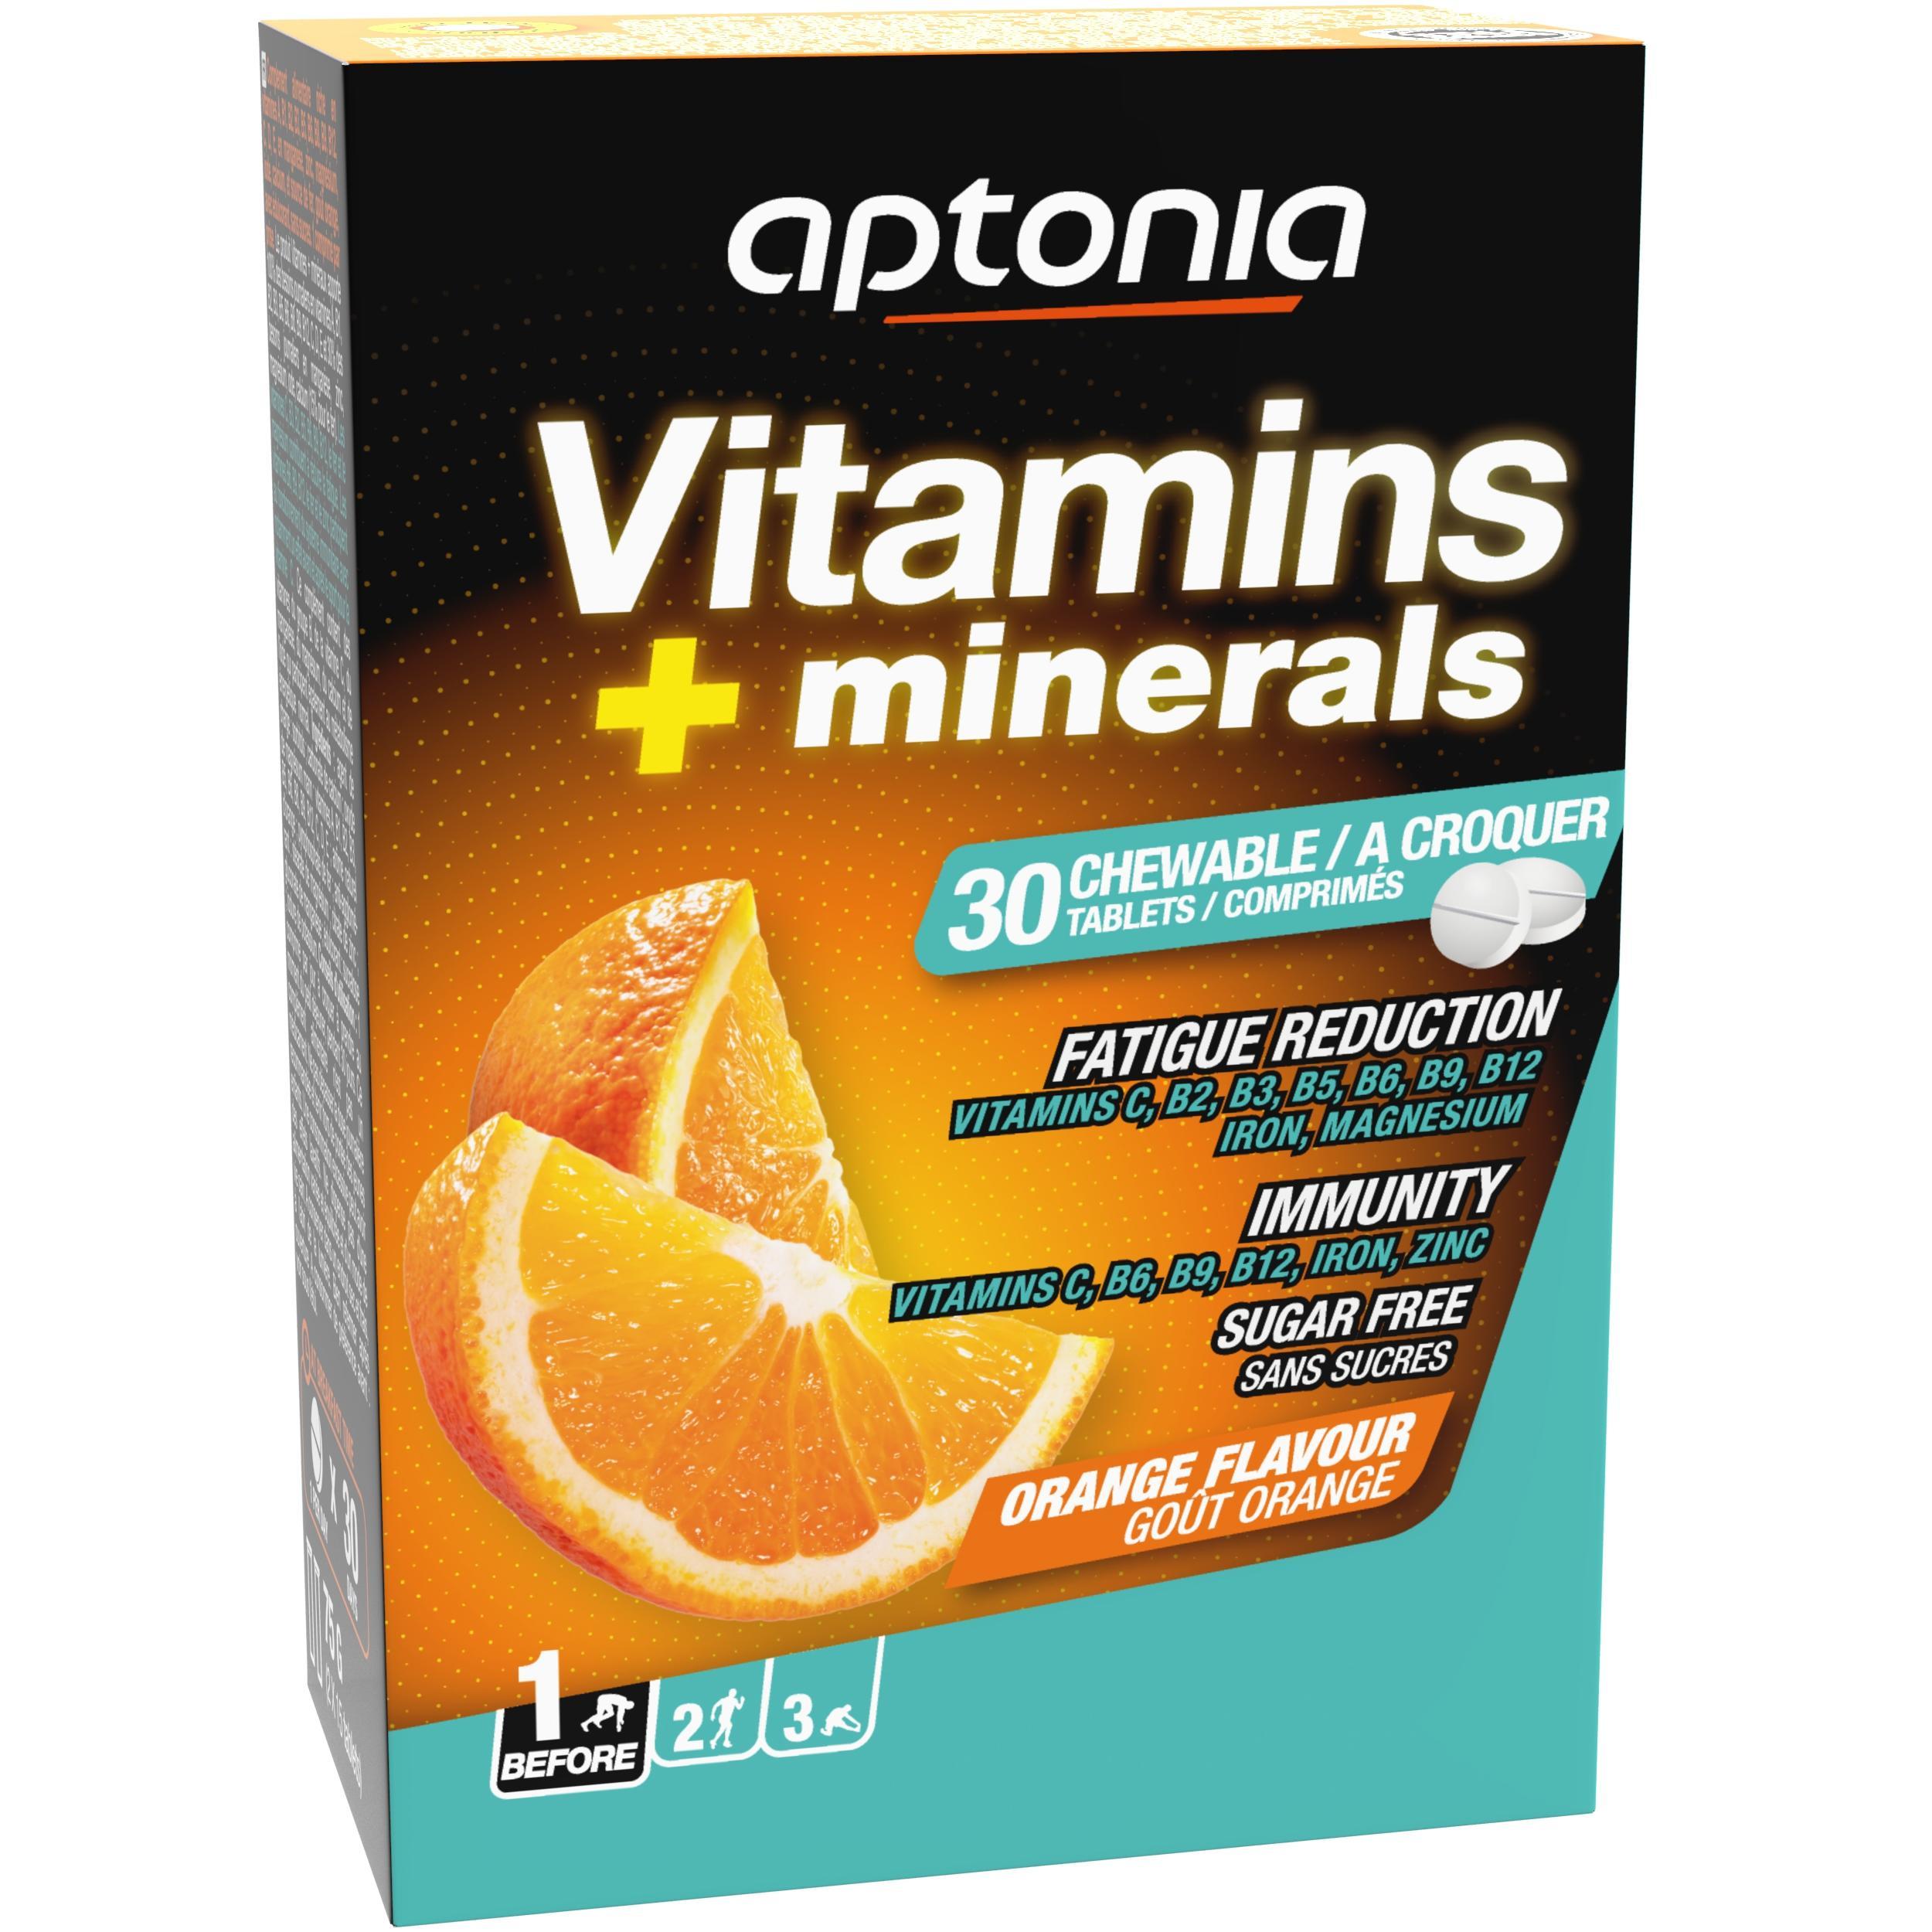 Vitamine Minerale Portocalăx30 de la APTONIA